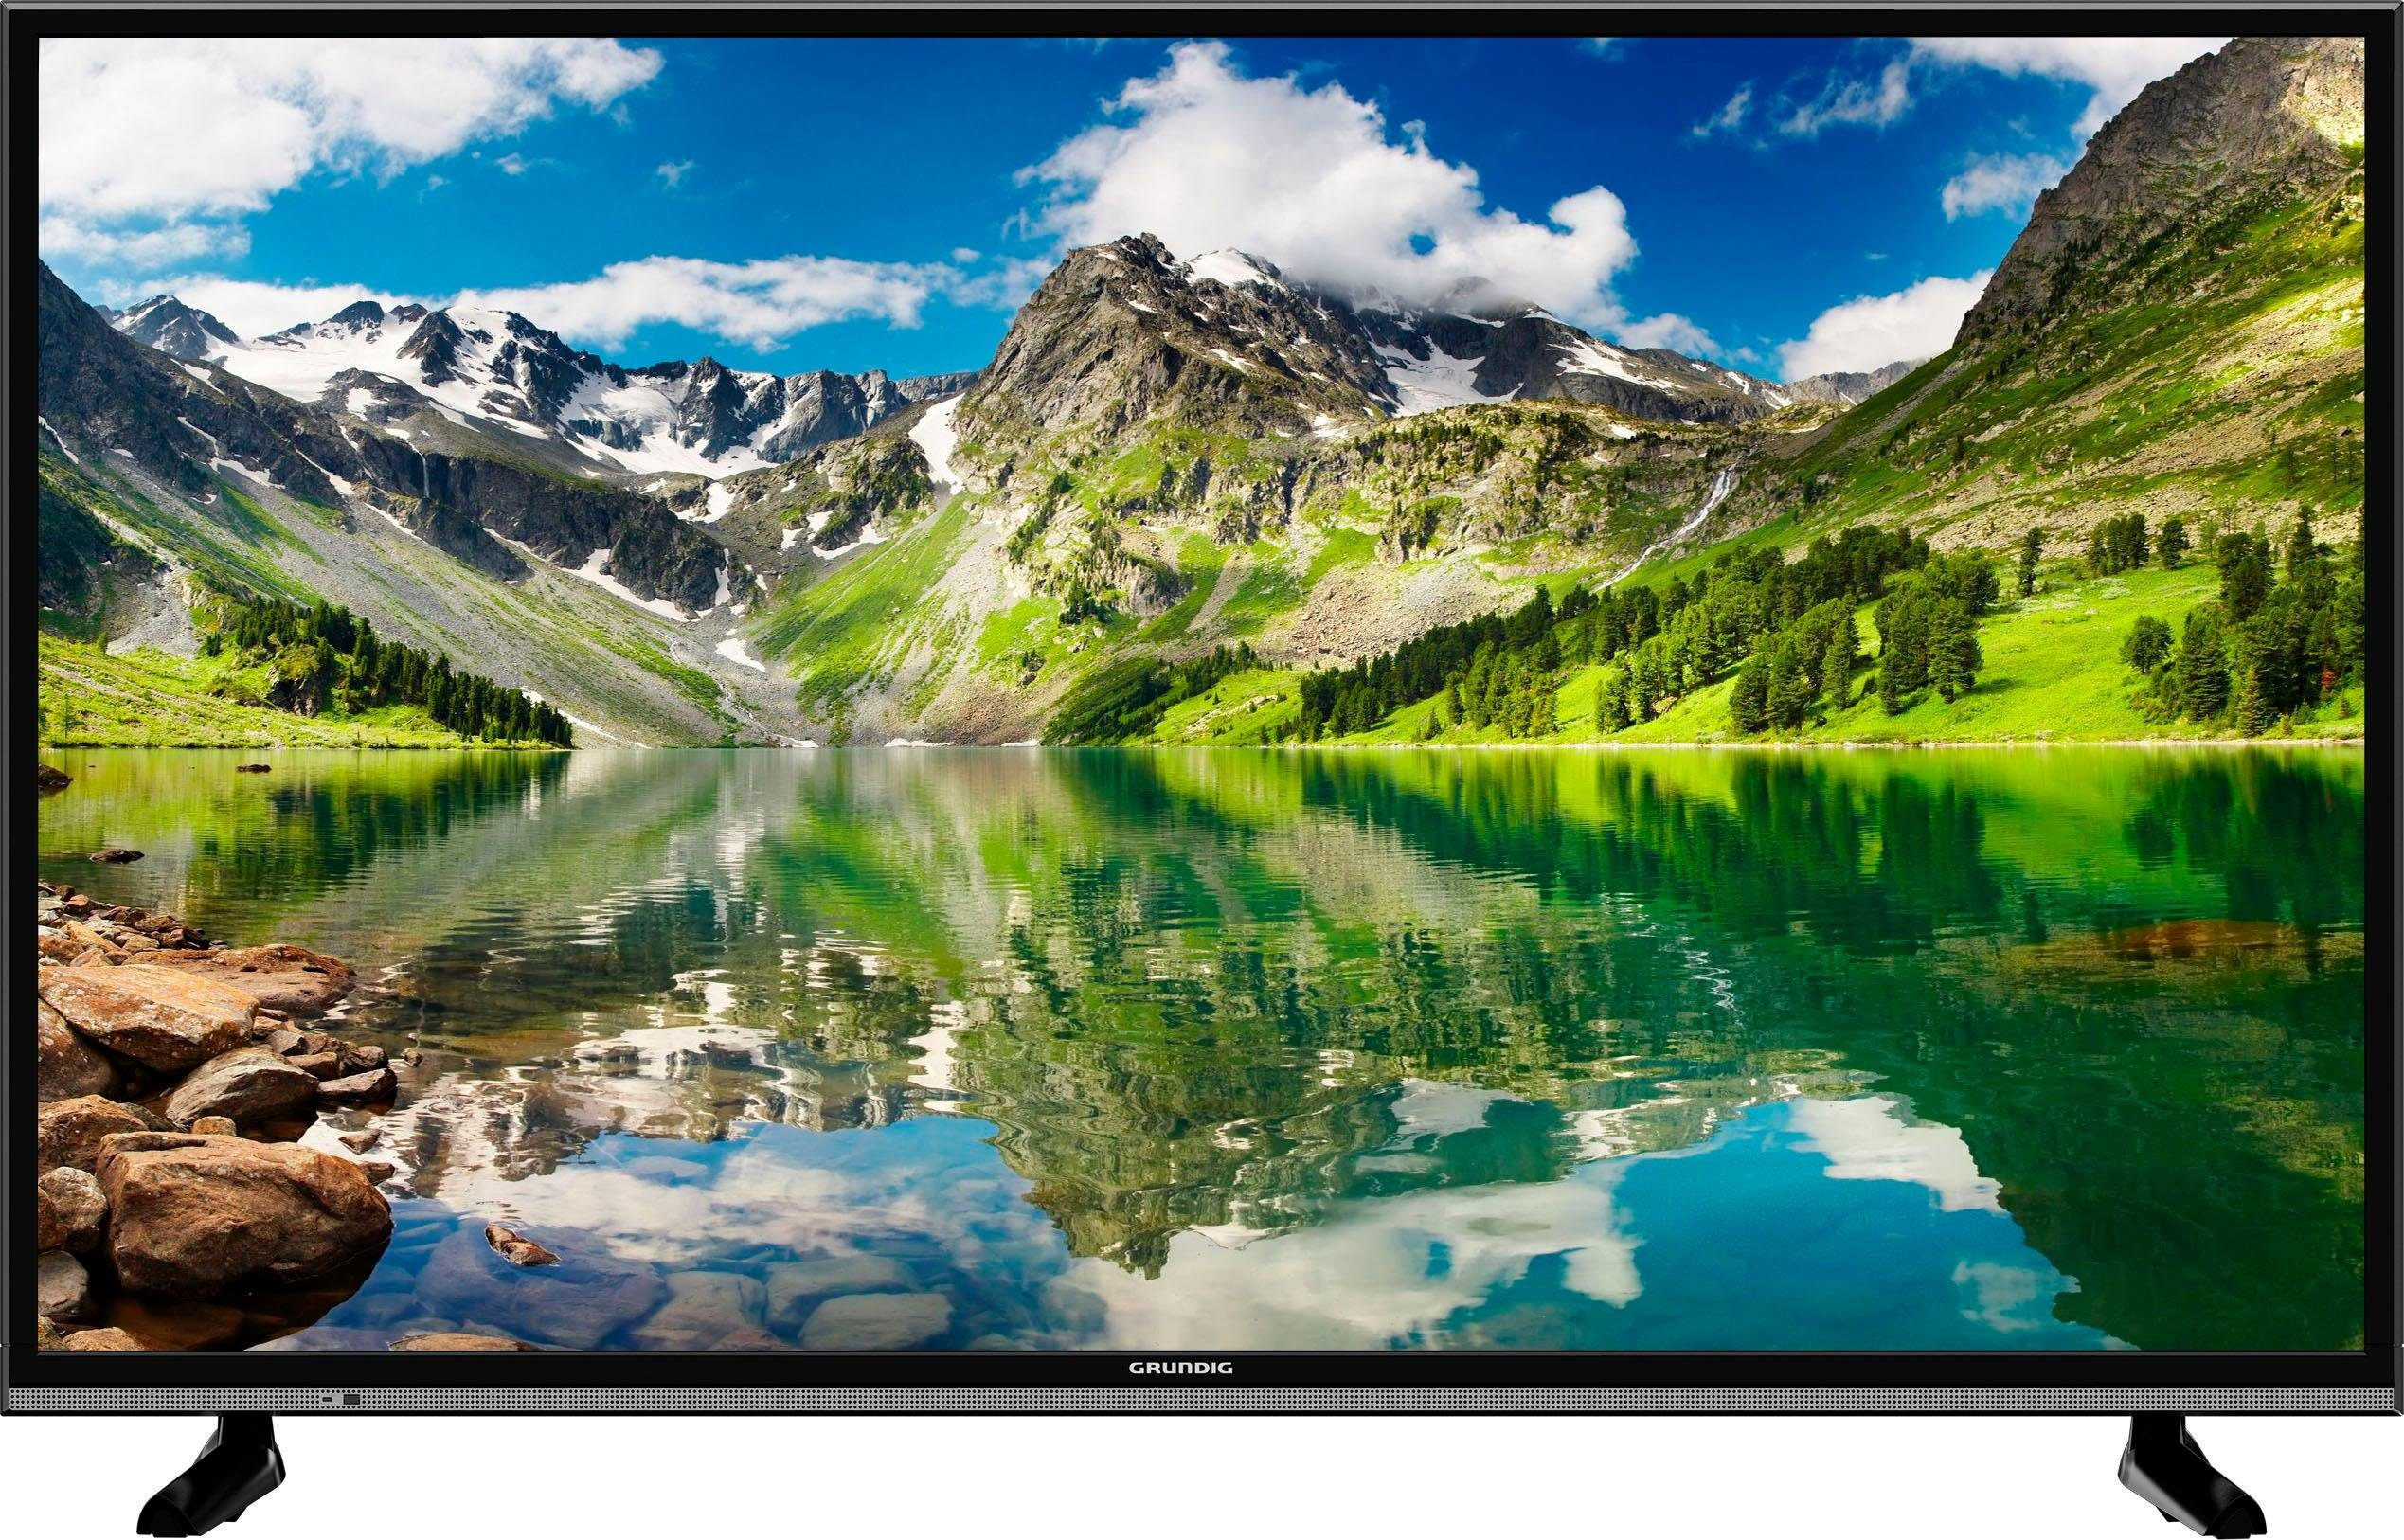 Grundig 55 VLX 8000 BP LED-Fernseher (139 cm/55 Zoll, 4K Ultra HD)